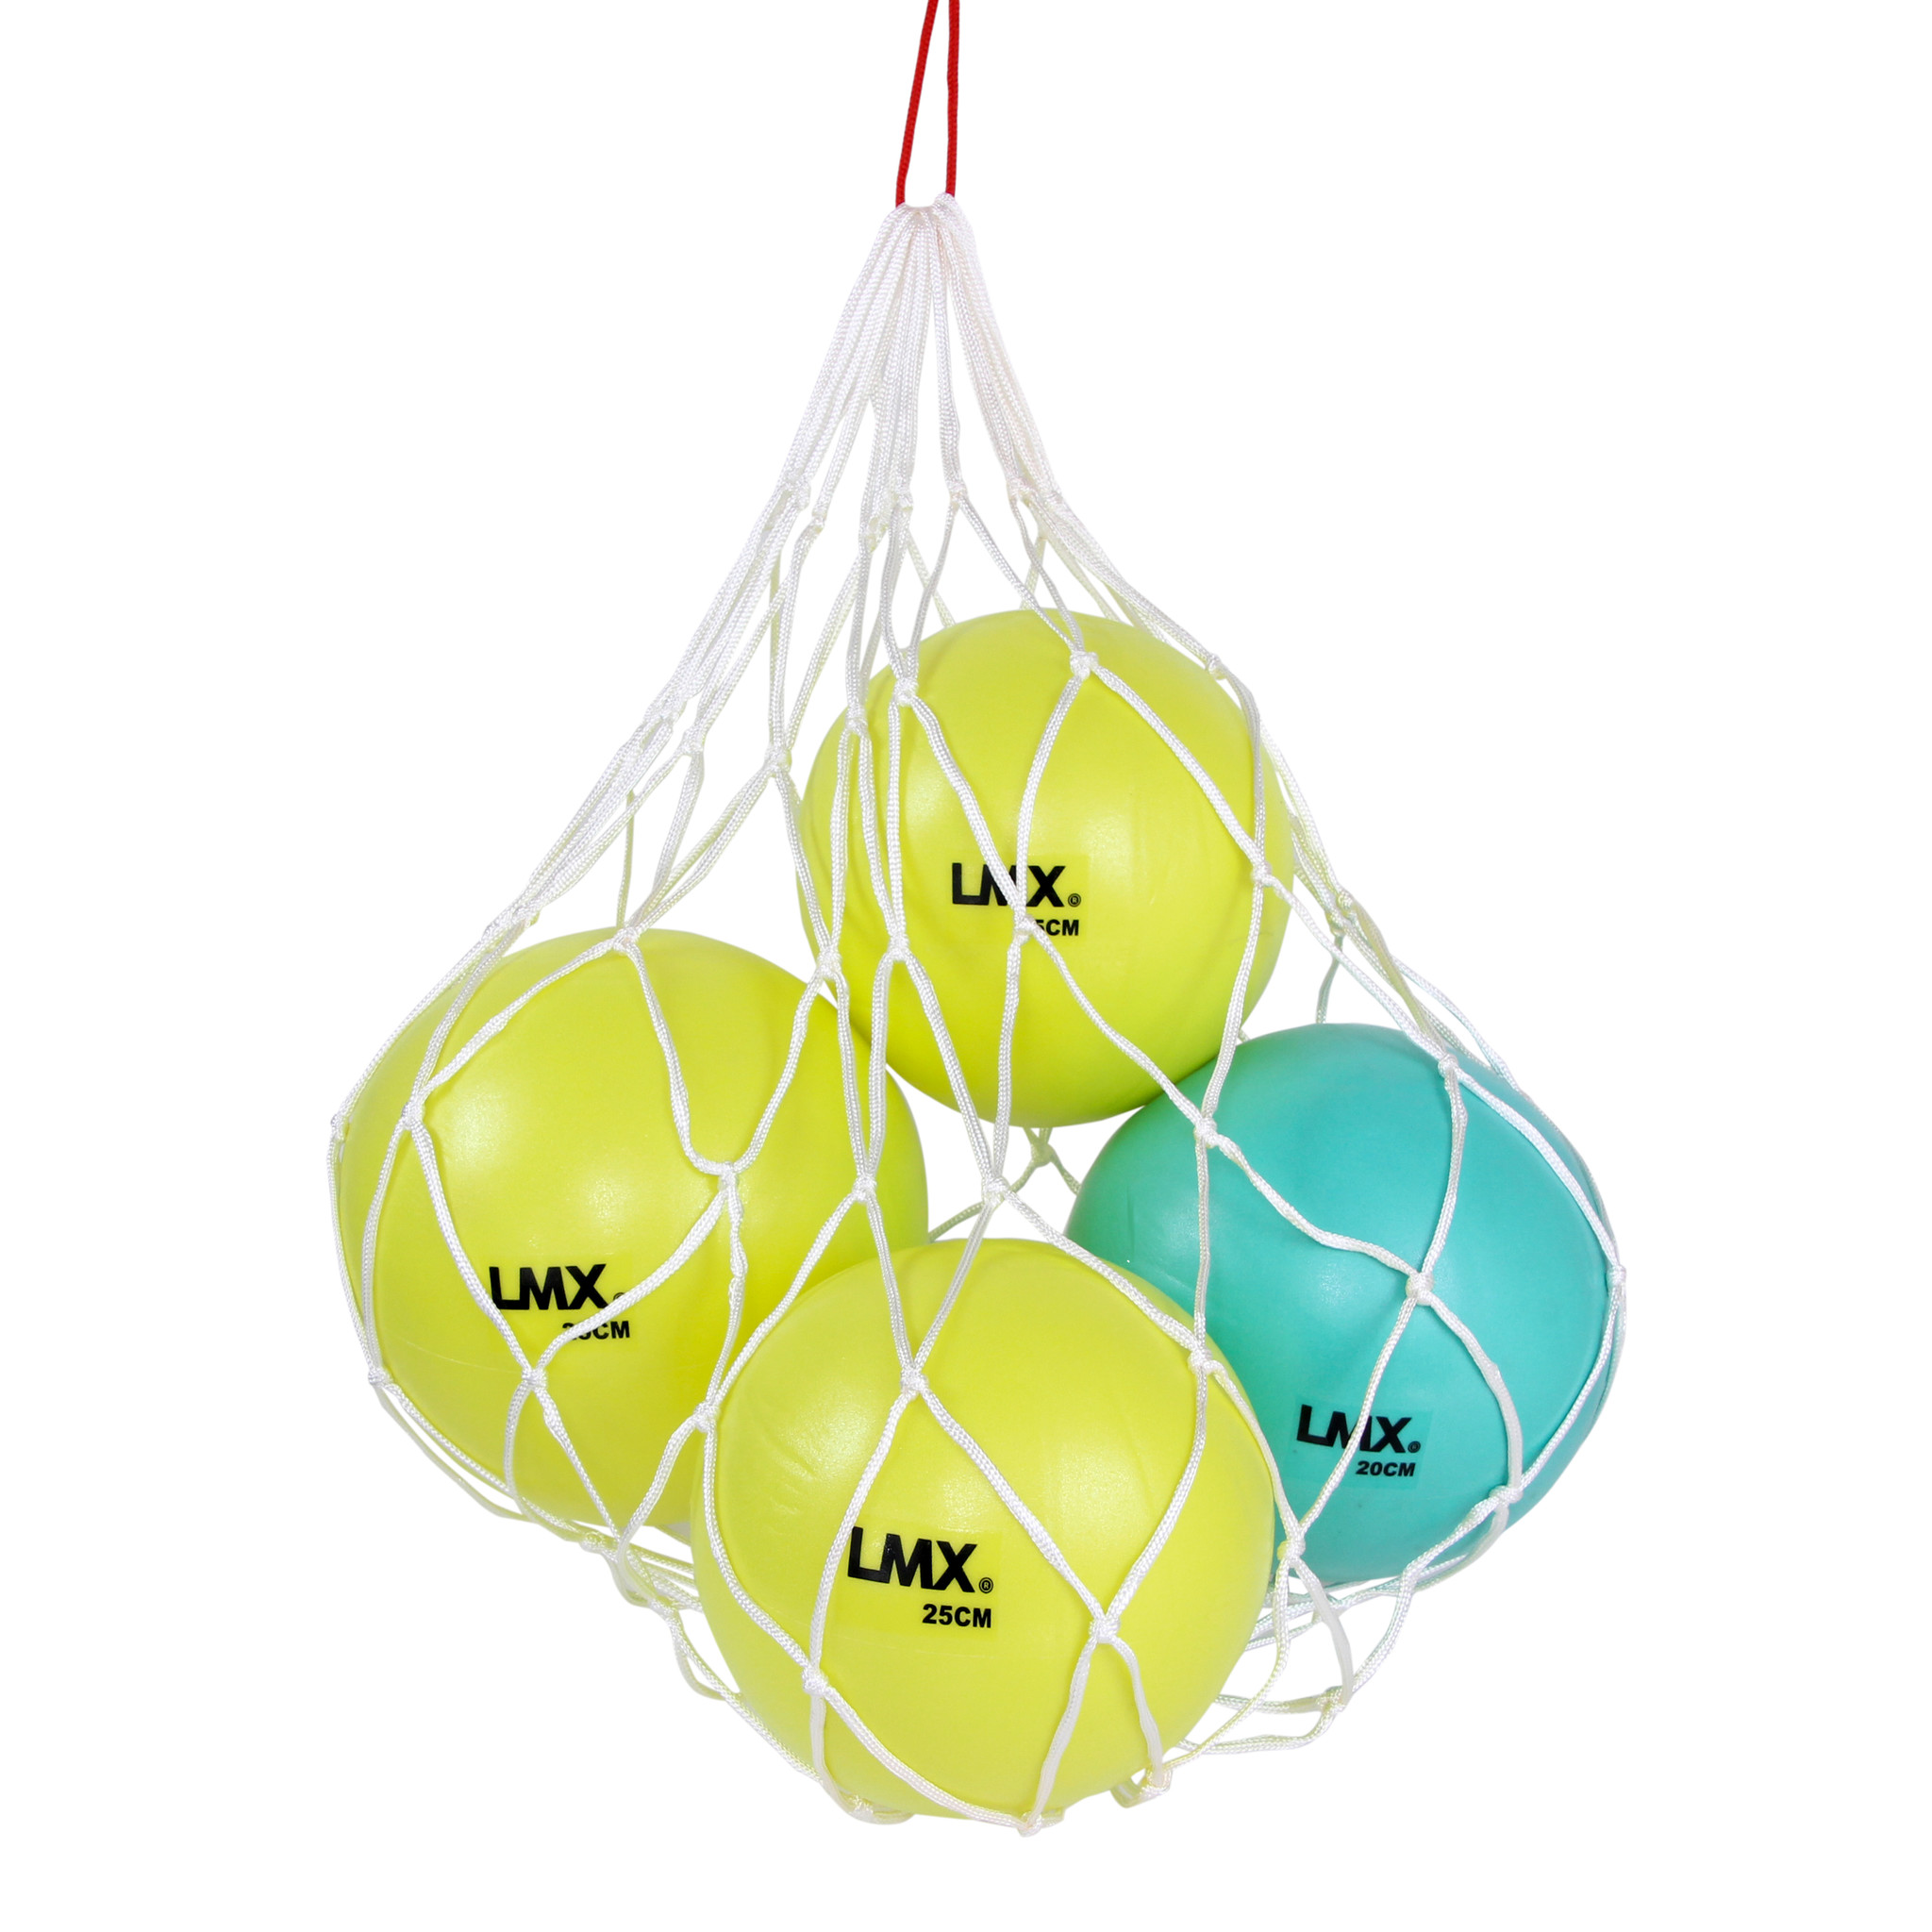 Lifemaxx® LMX1260.BAG Pilates ball net (white)